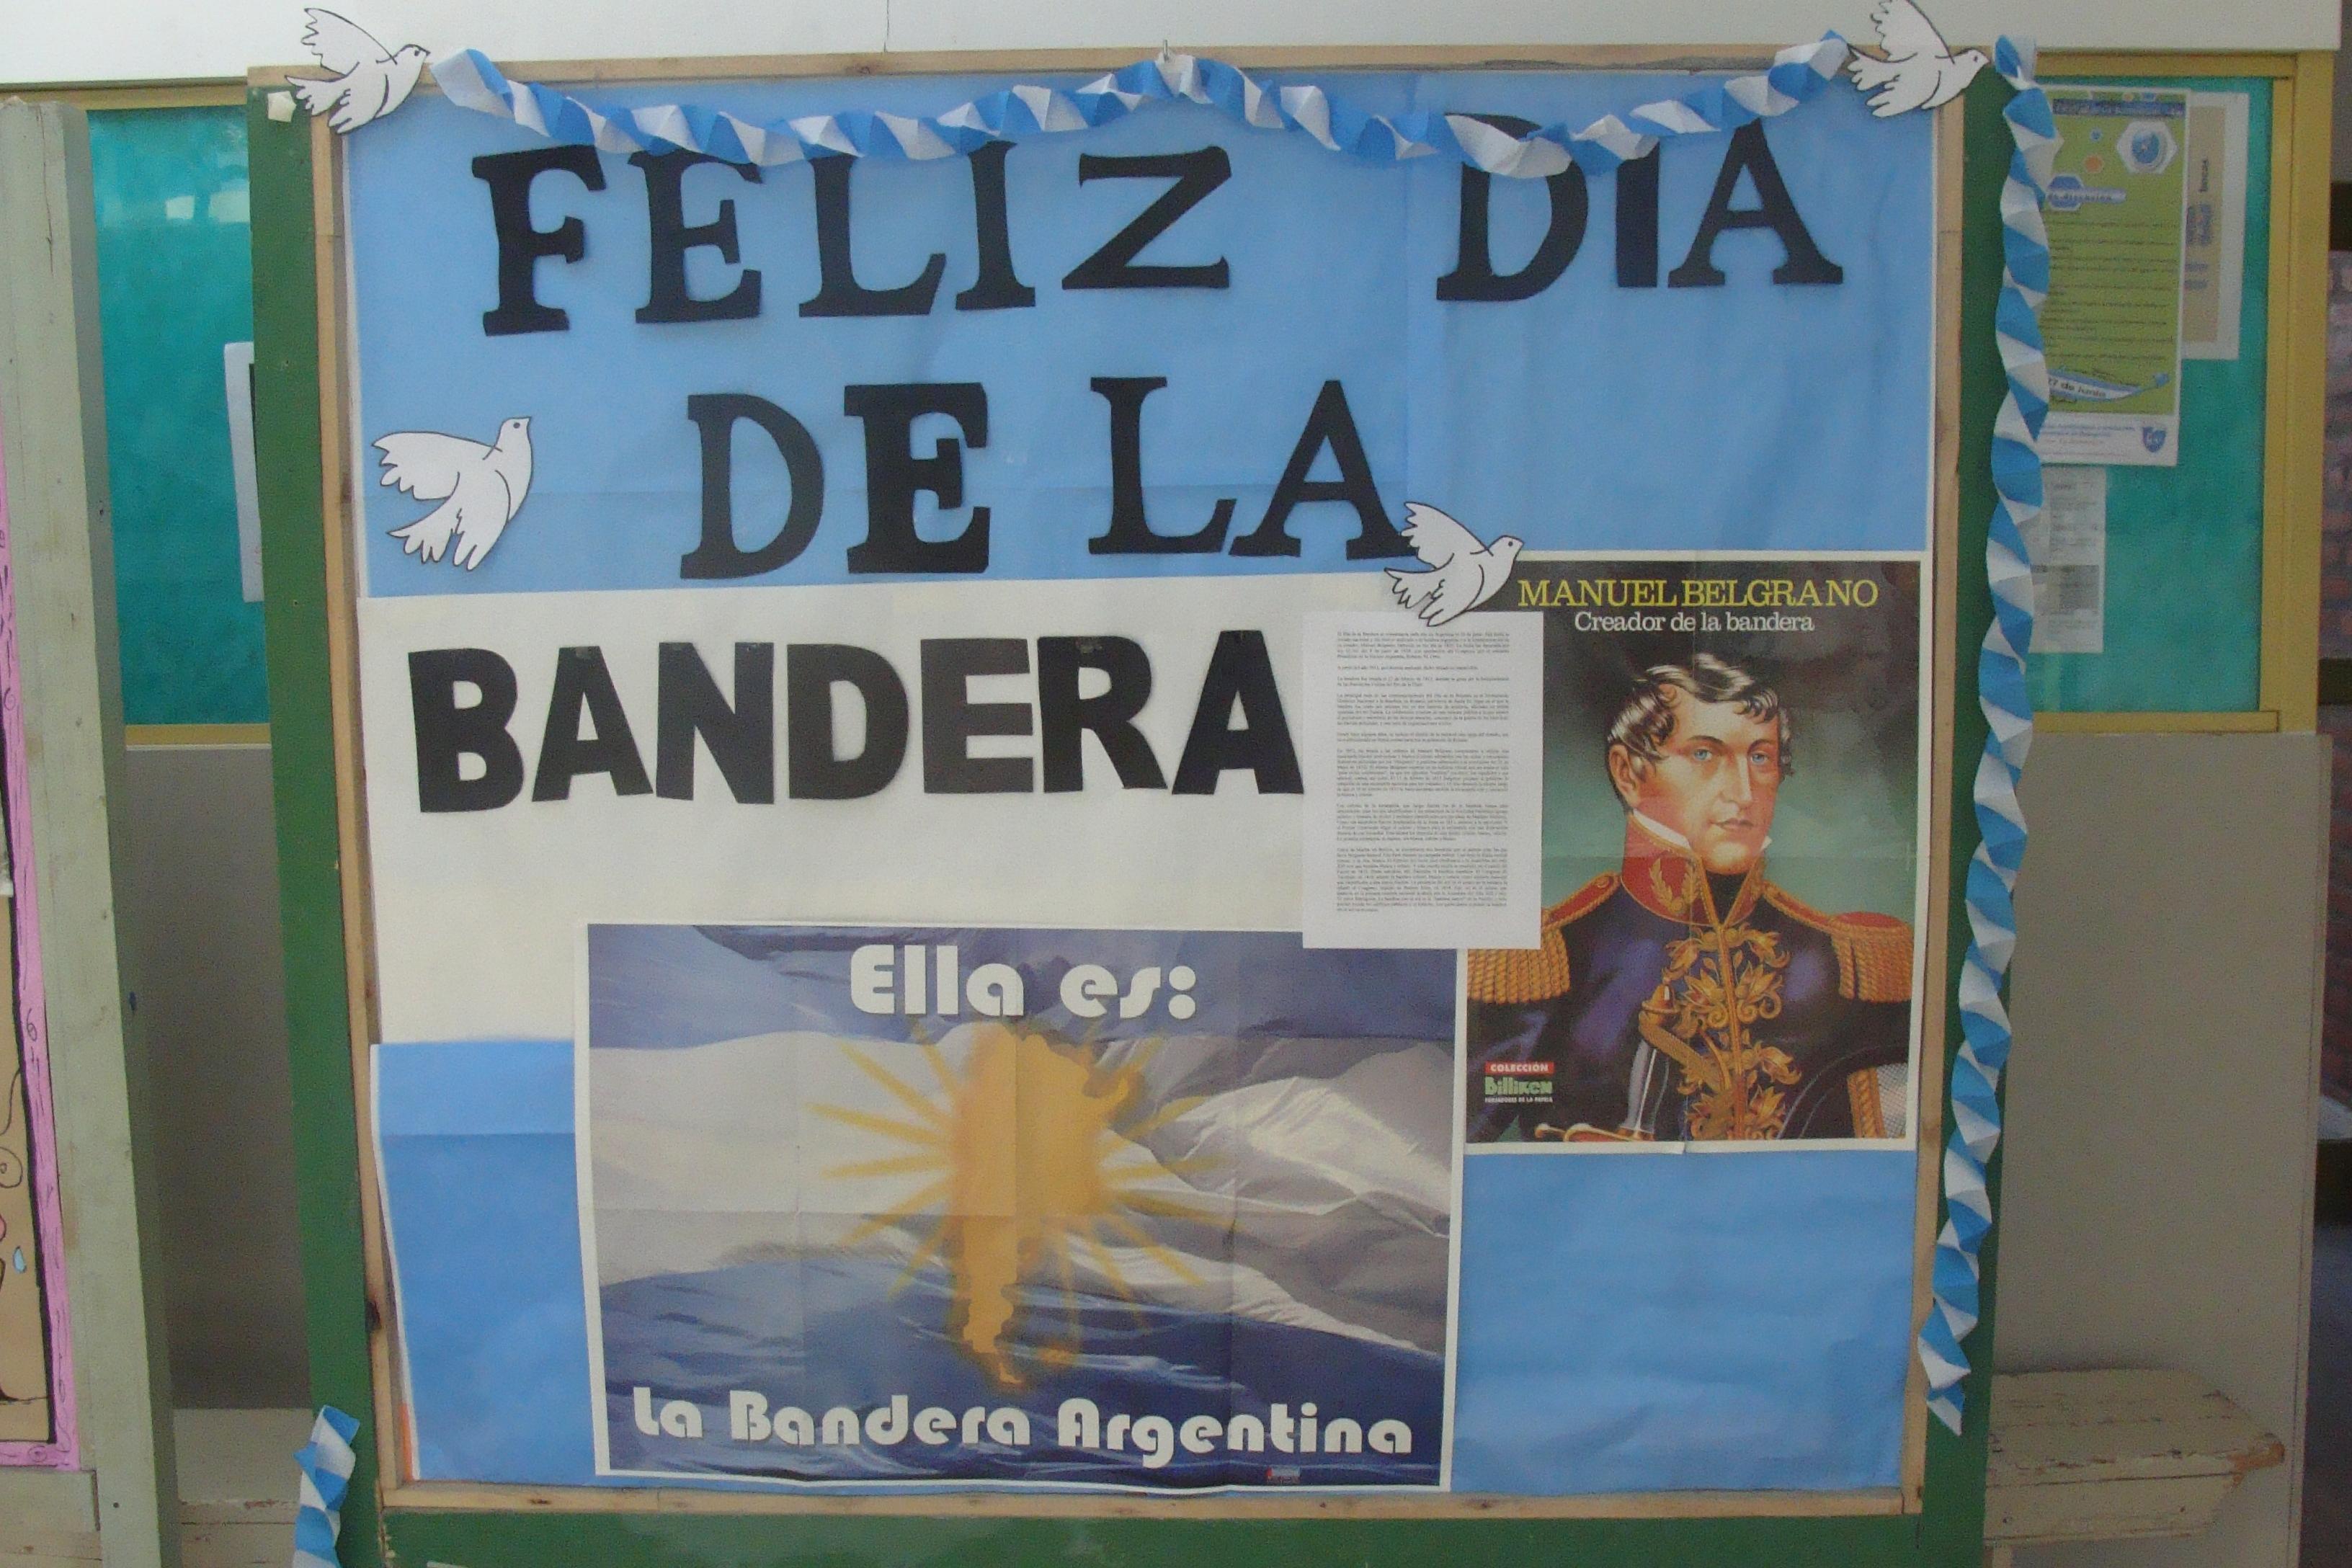 Feliz d a de la bandera bienvenidos for El mural pelicula argentina